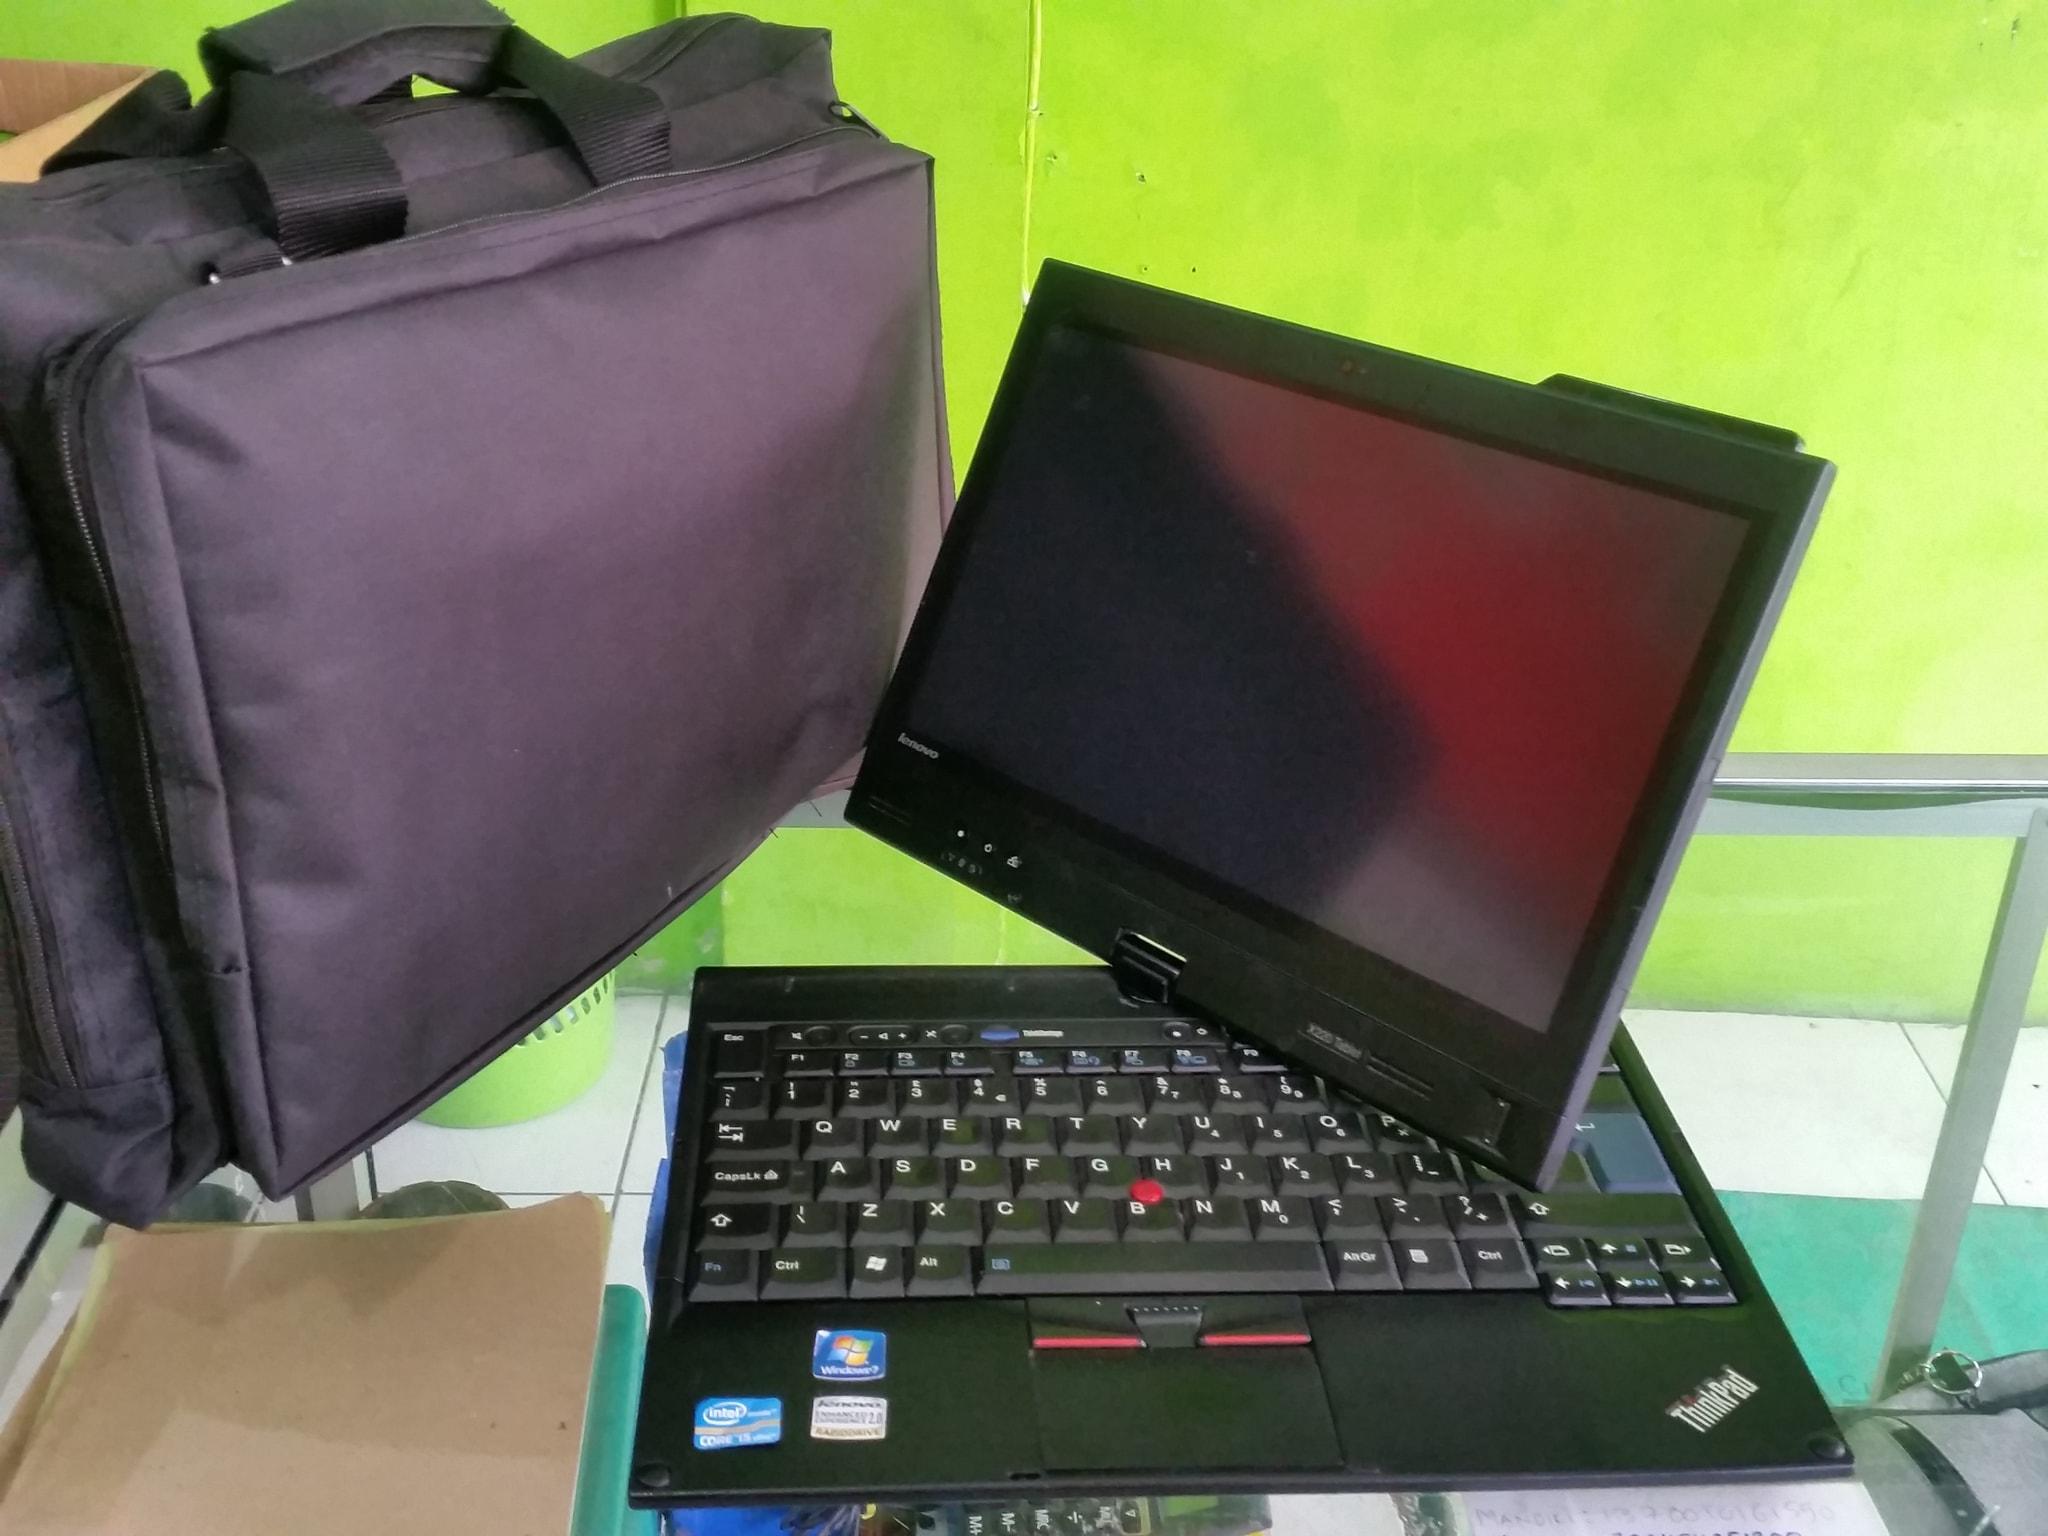 Jual Lenovo X220 Tablet layar sentuh